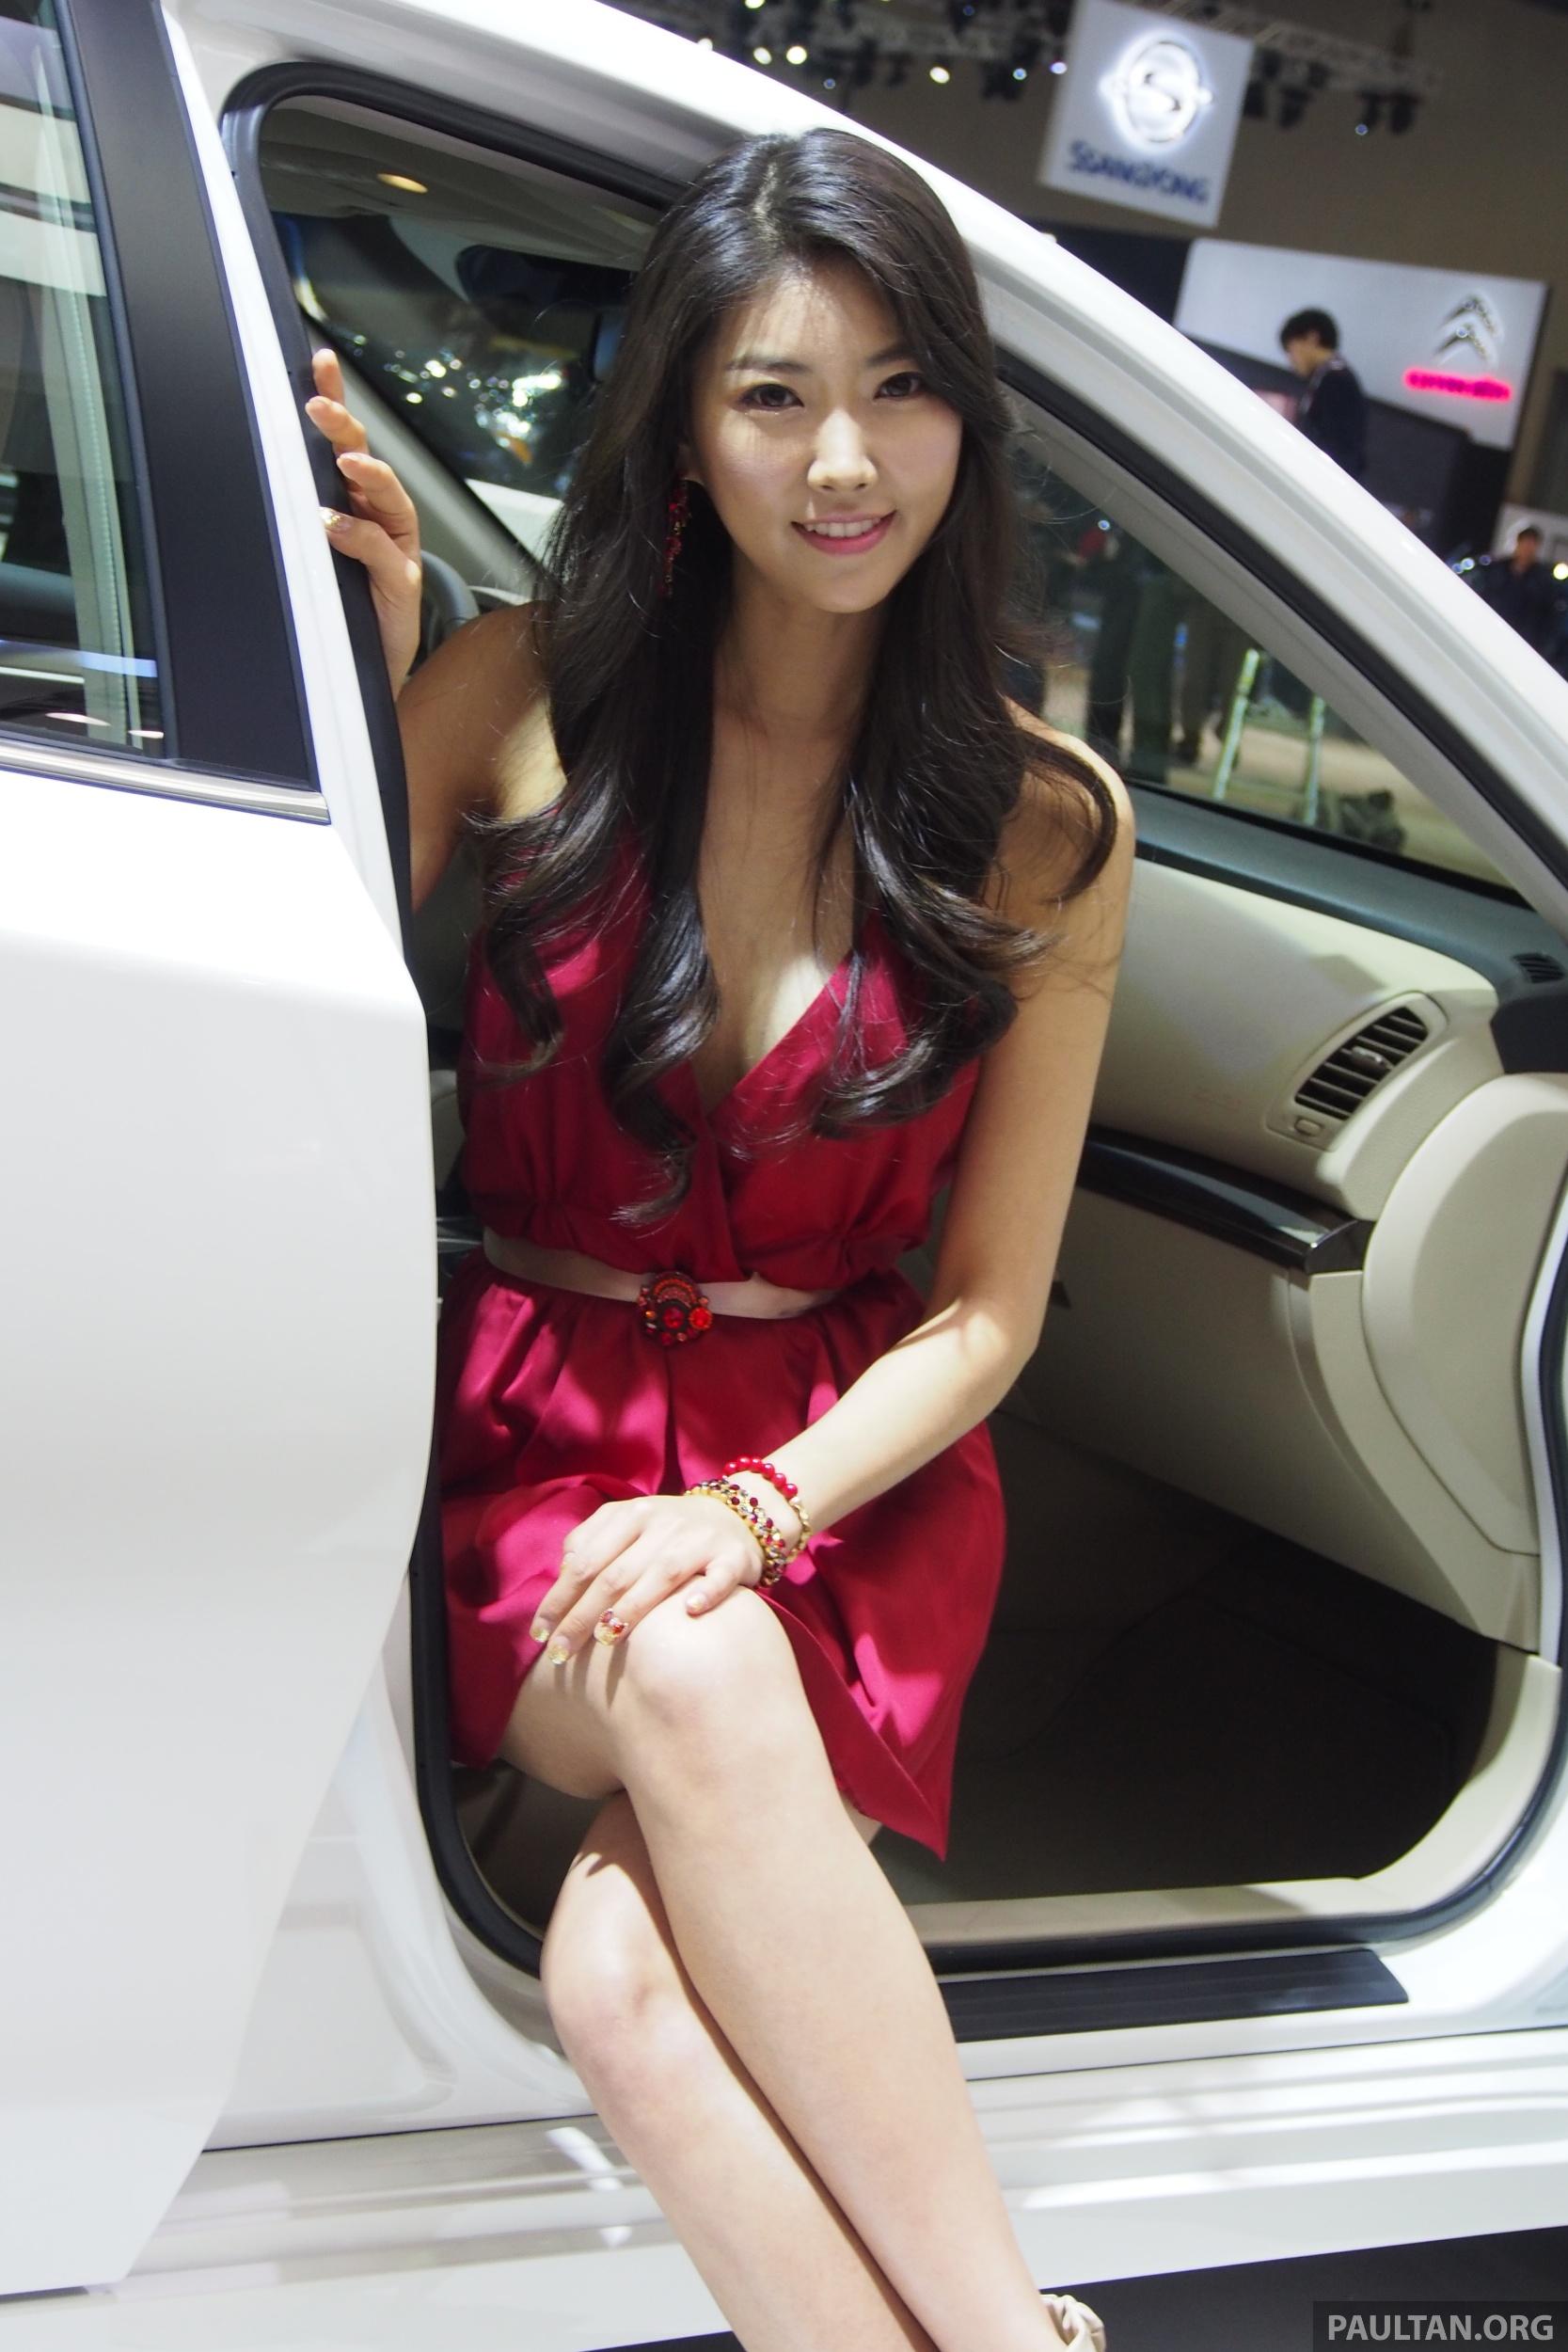 Seoul 2013 Gangnam Girls Say Annyeong Haseyo Image 165312